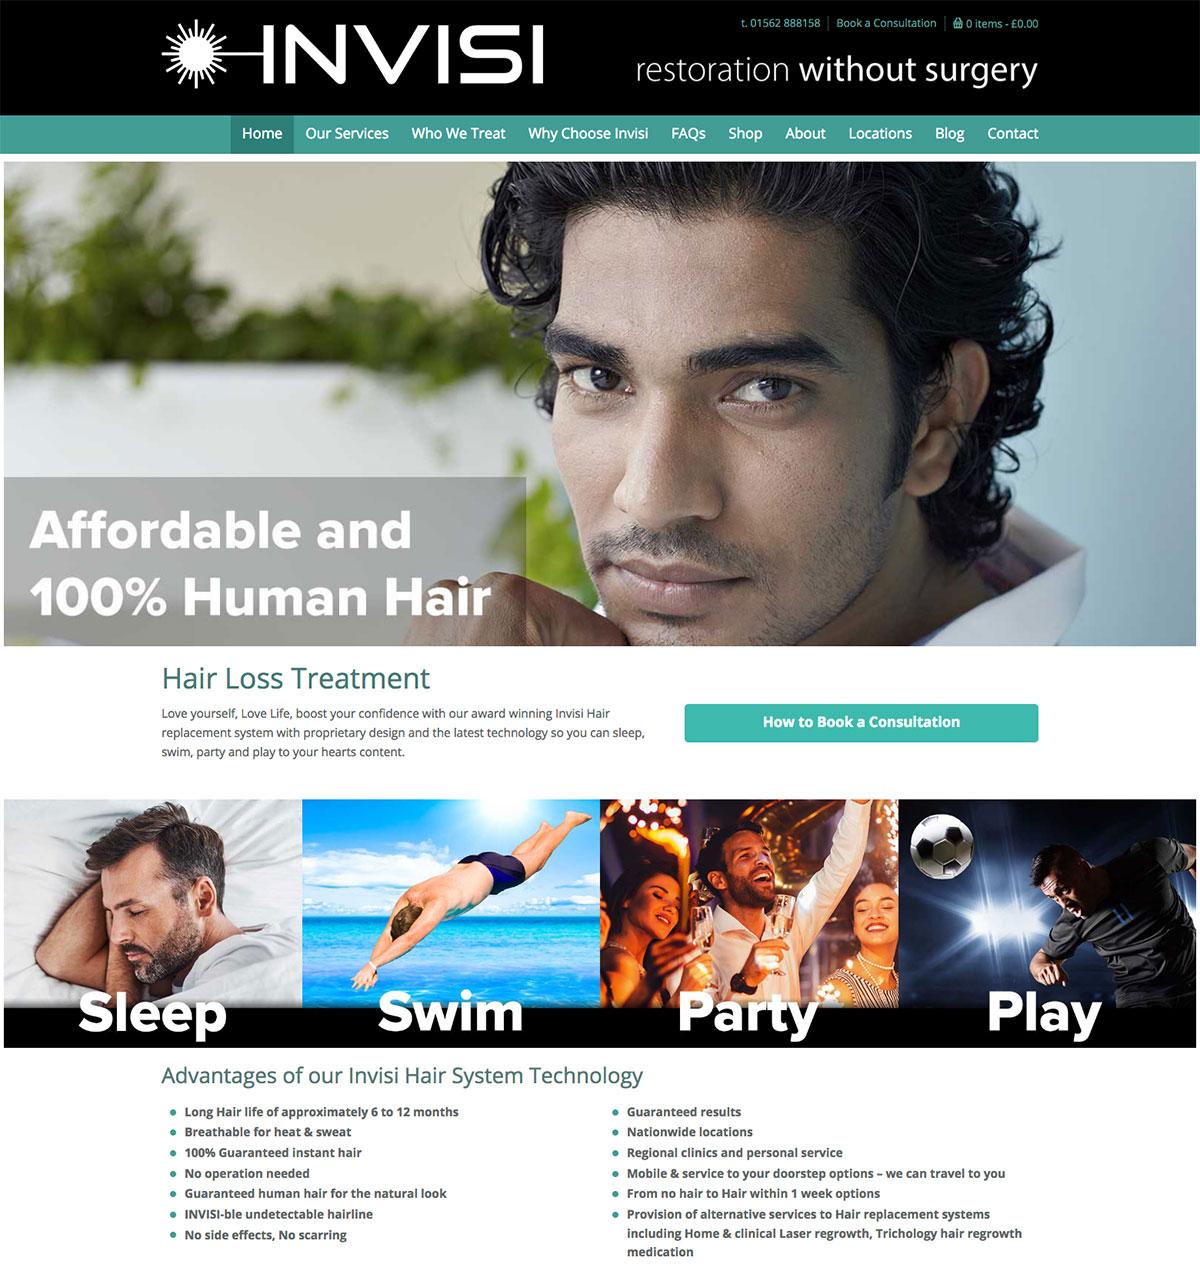 Invisi Hair Responsive Website